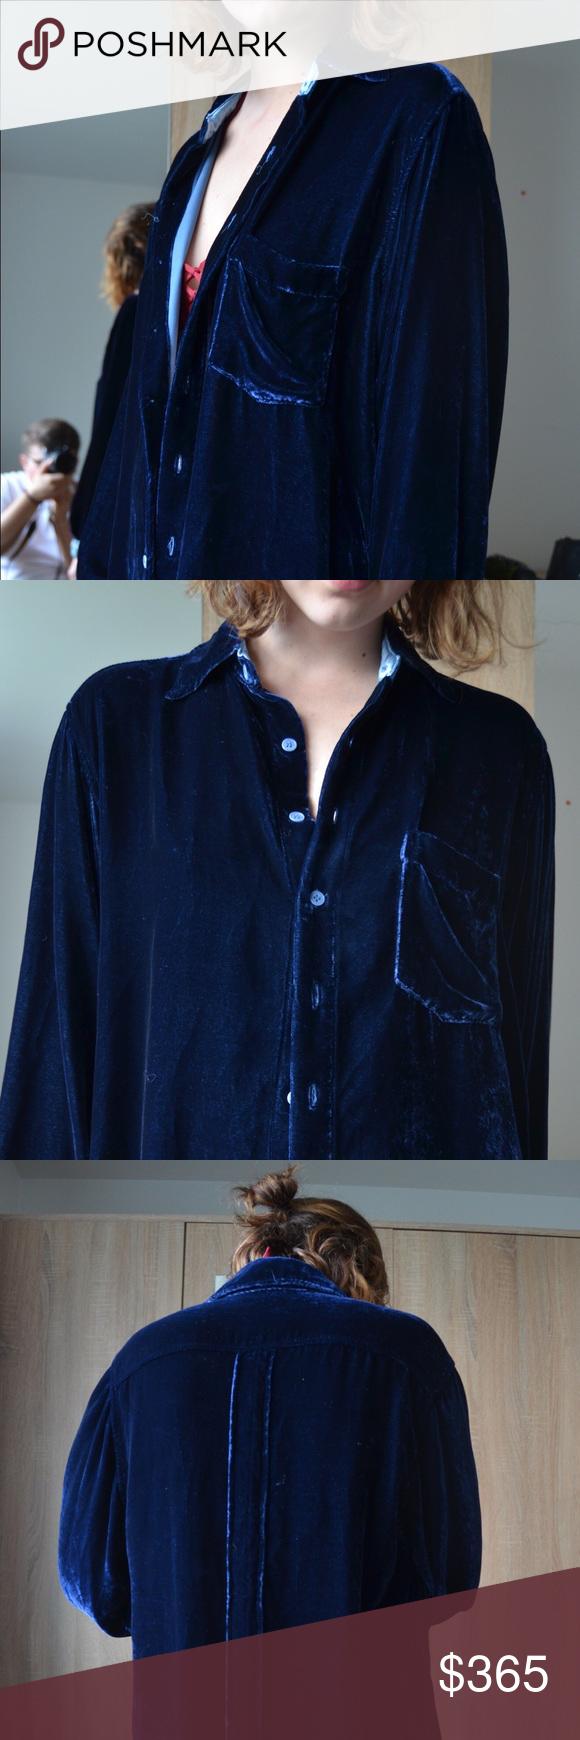 Afterlife Midnight Blue Velvet Dress Shirt My Posh Closet